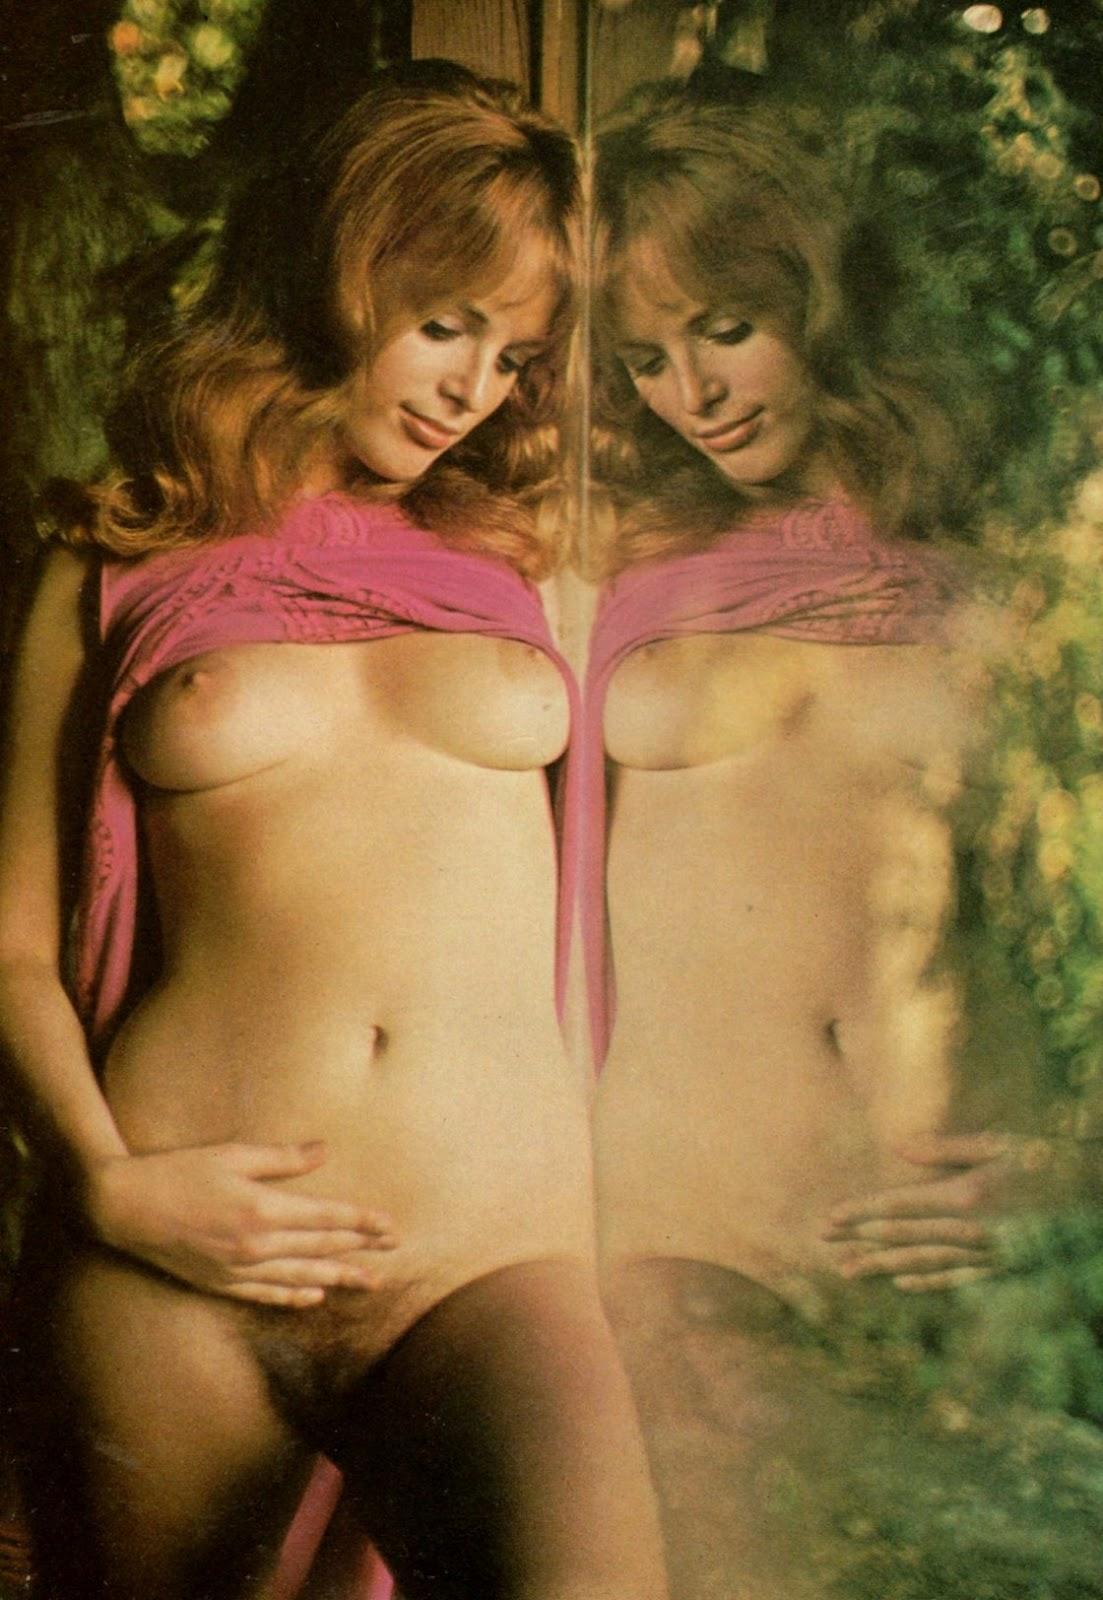 Brigitte maier nude